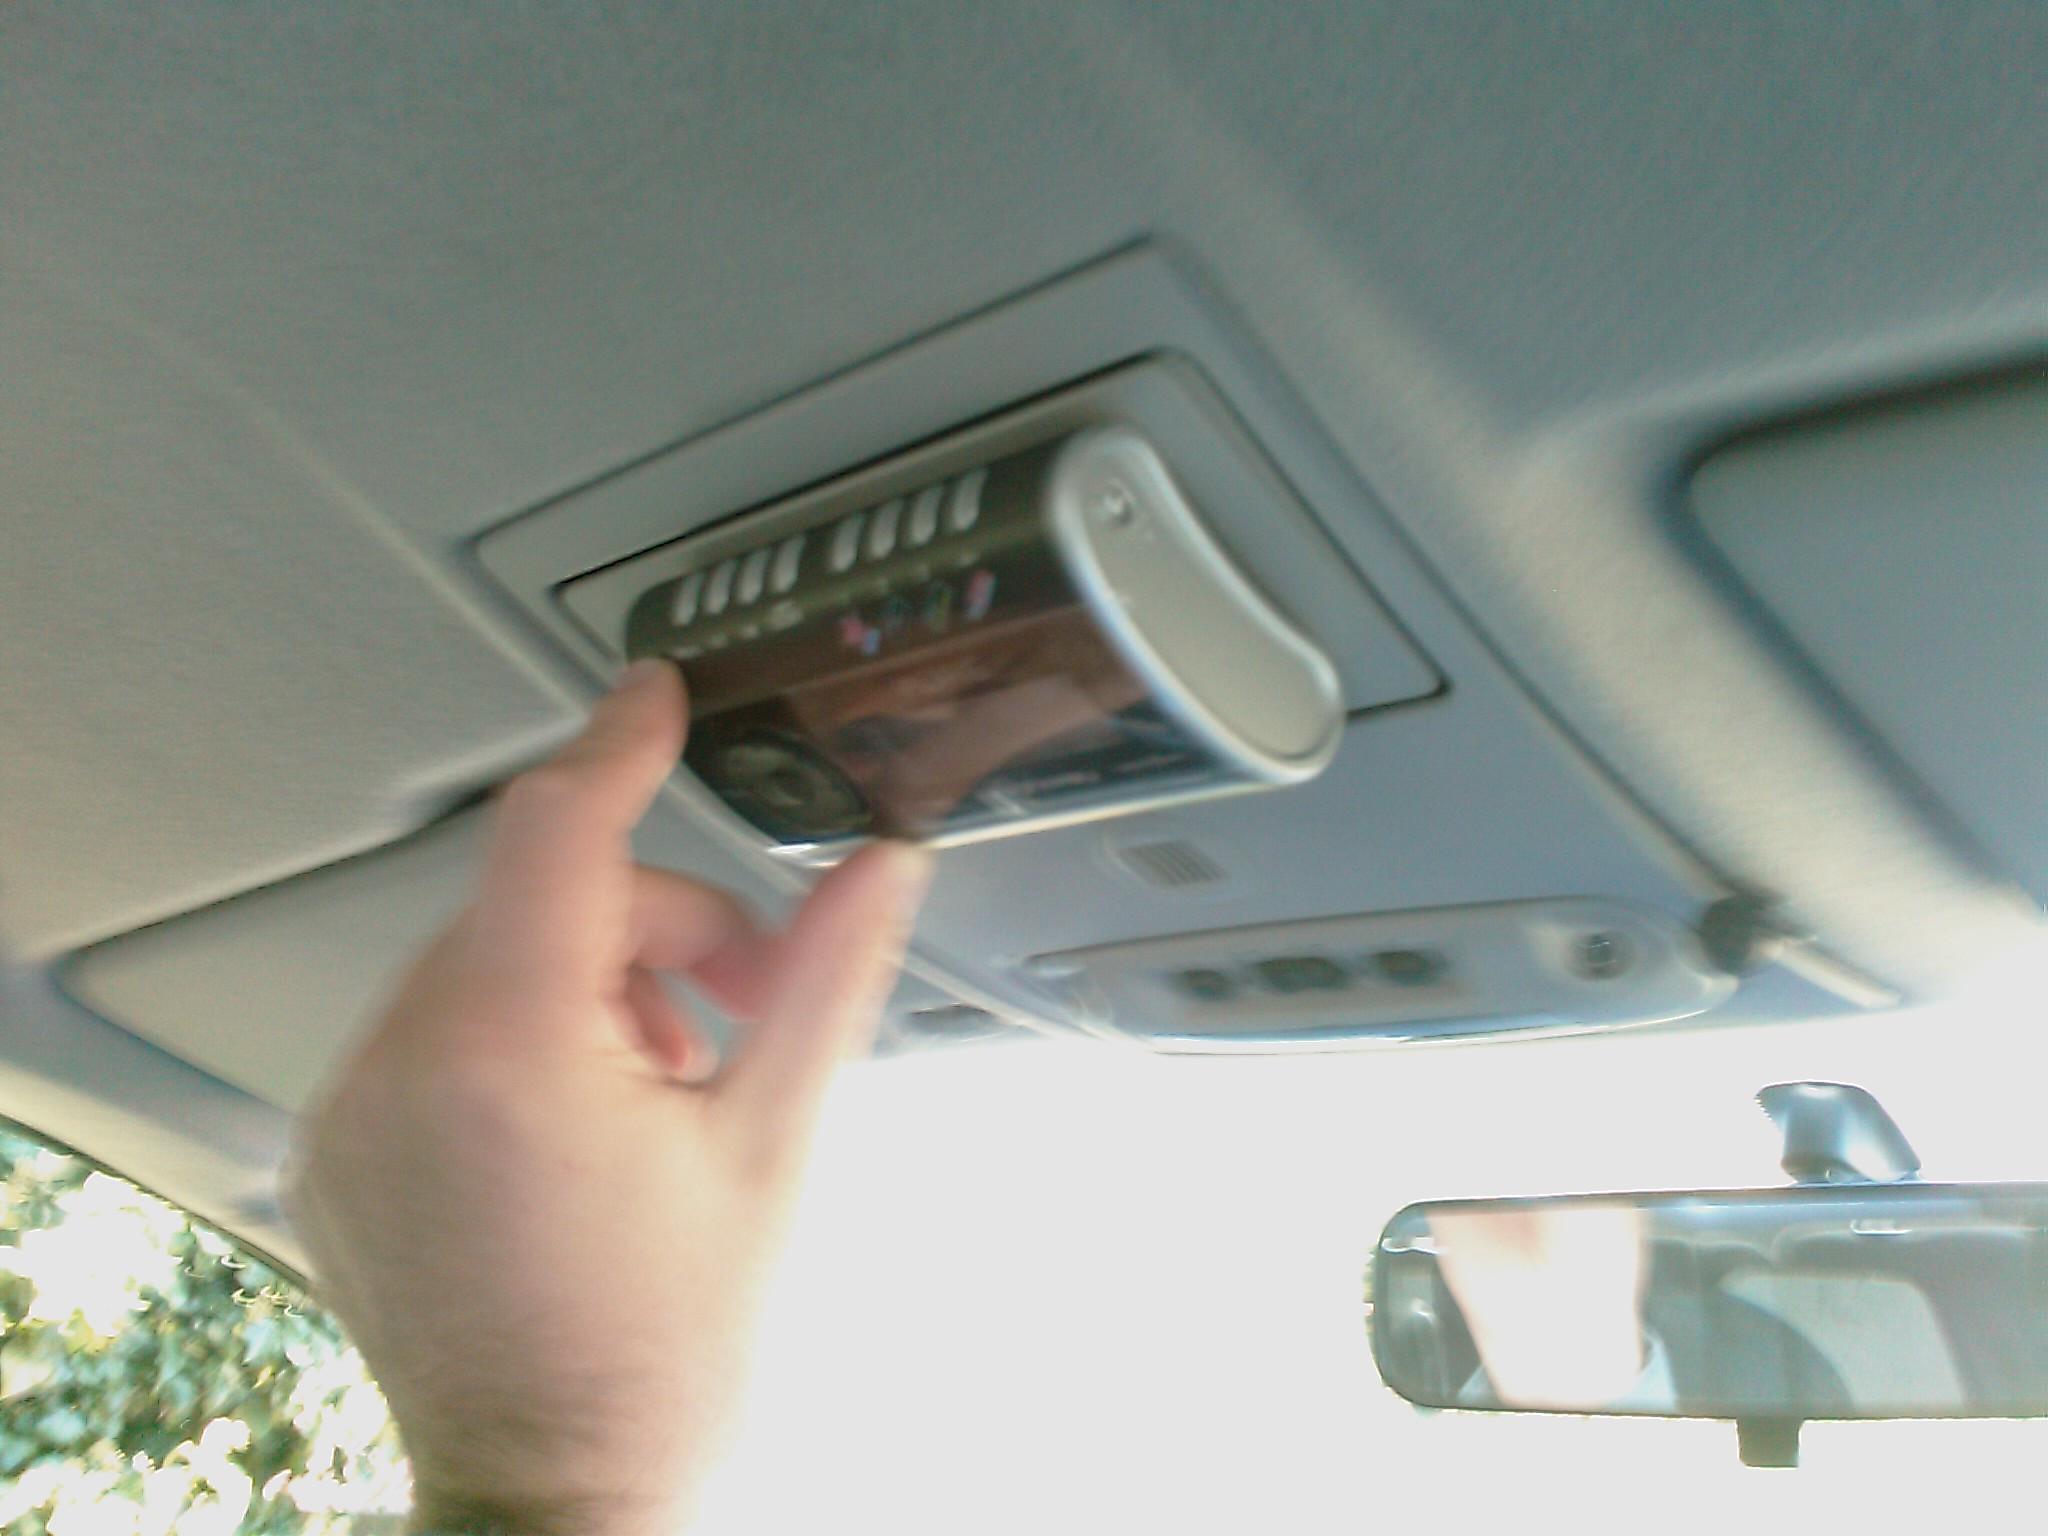 Sunglass Holder For Car Louisiana Bucket Brigade